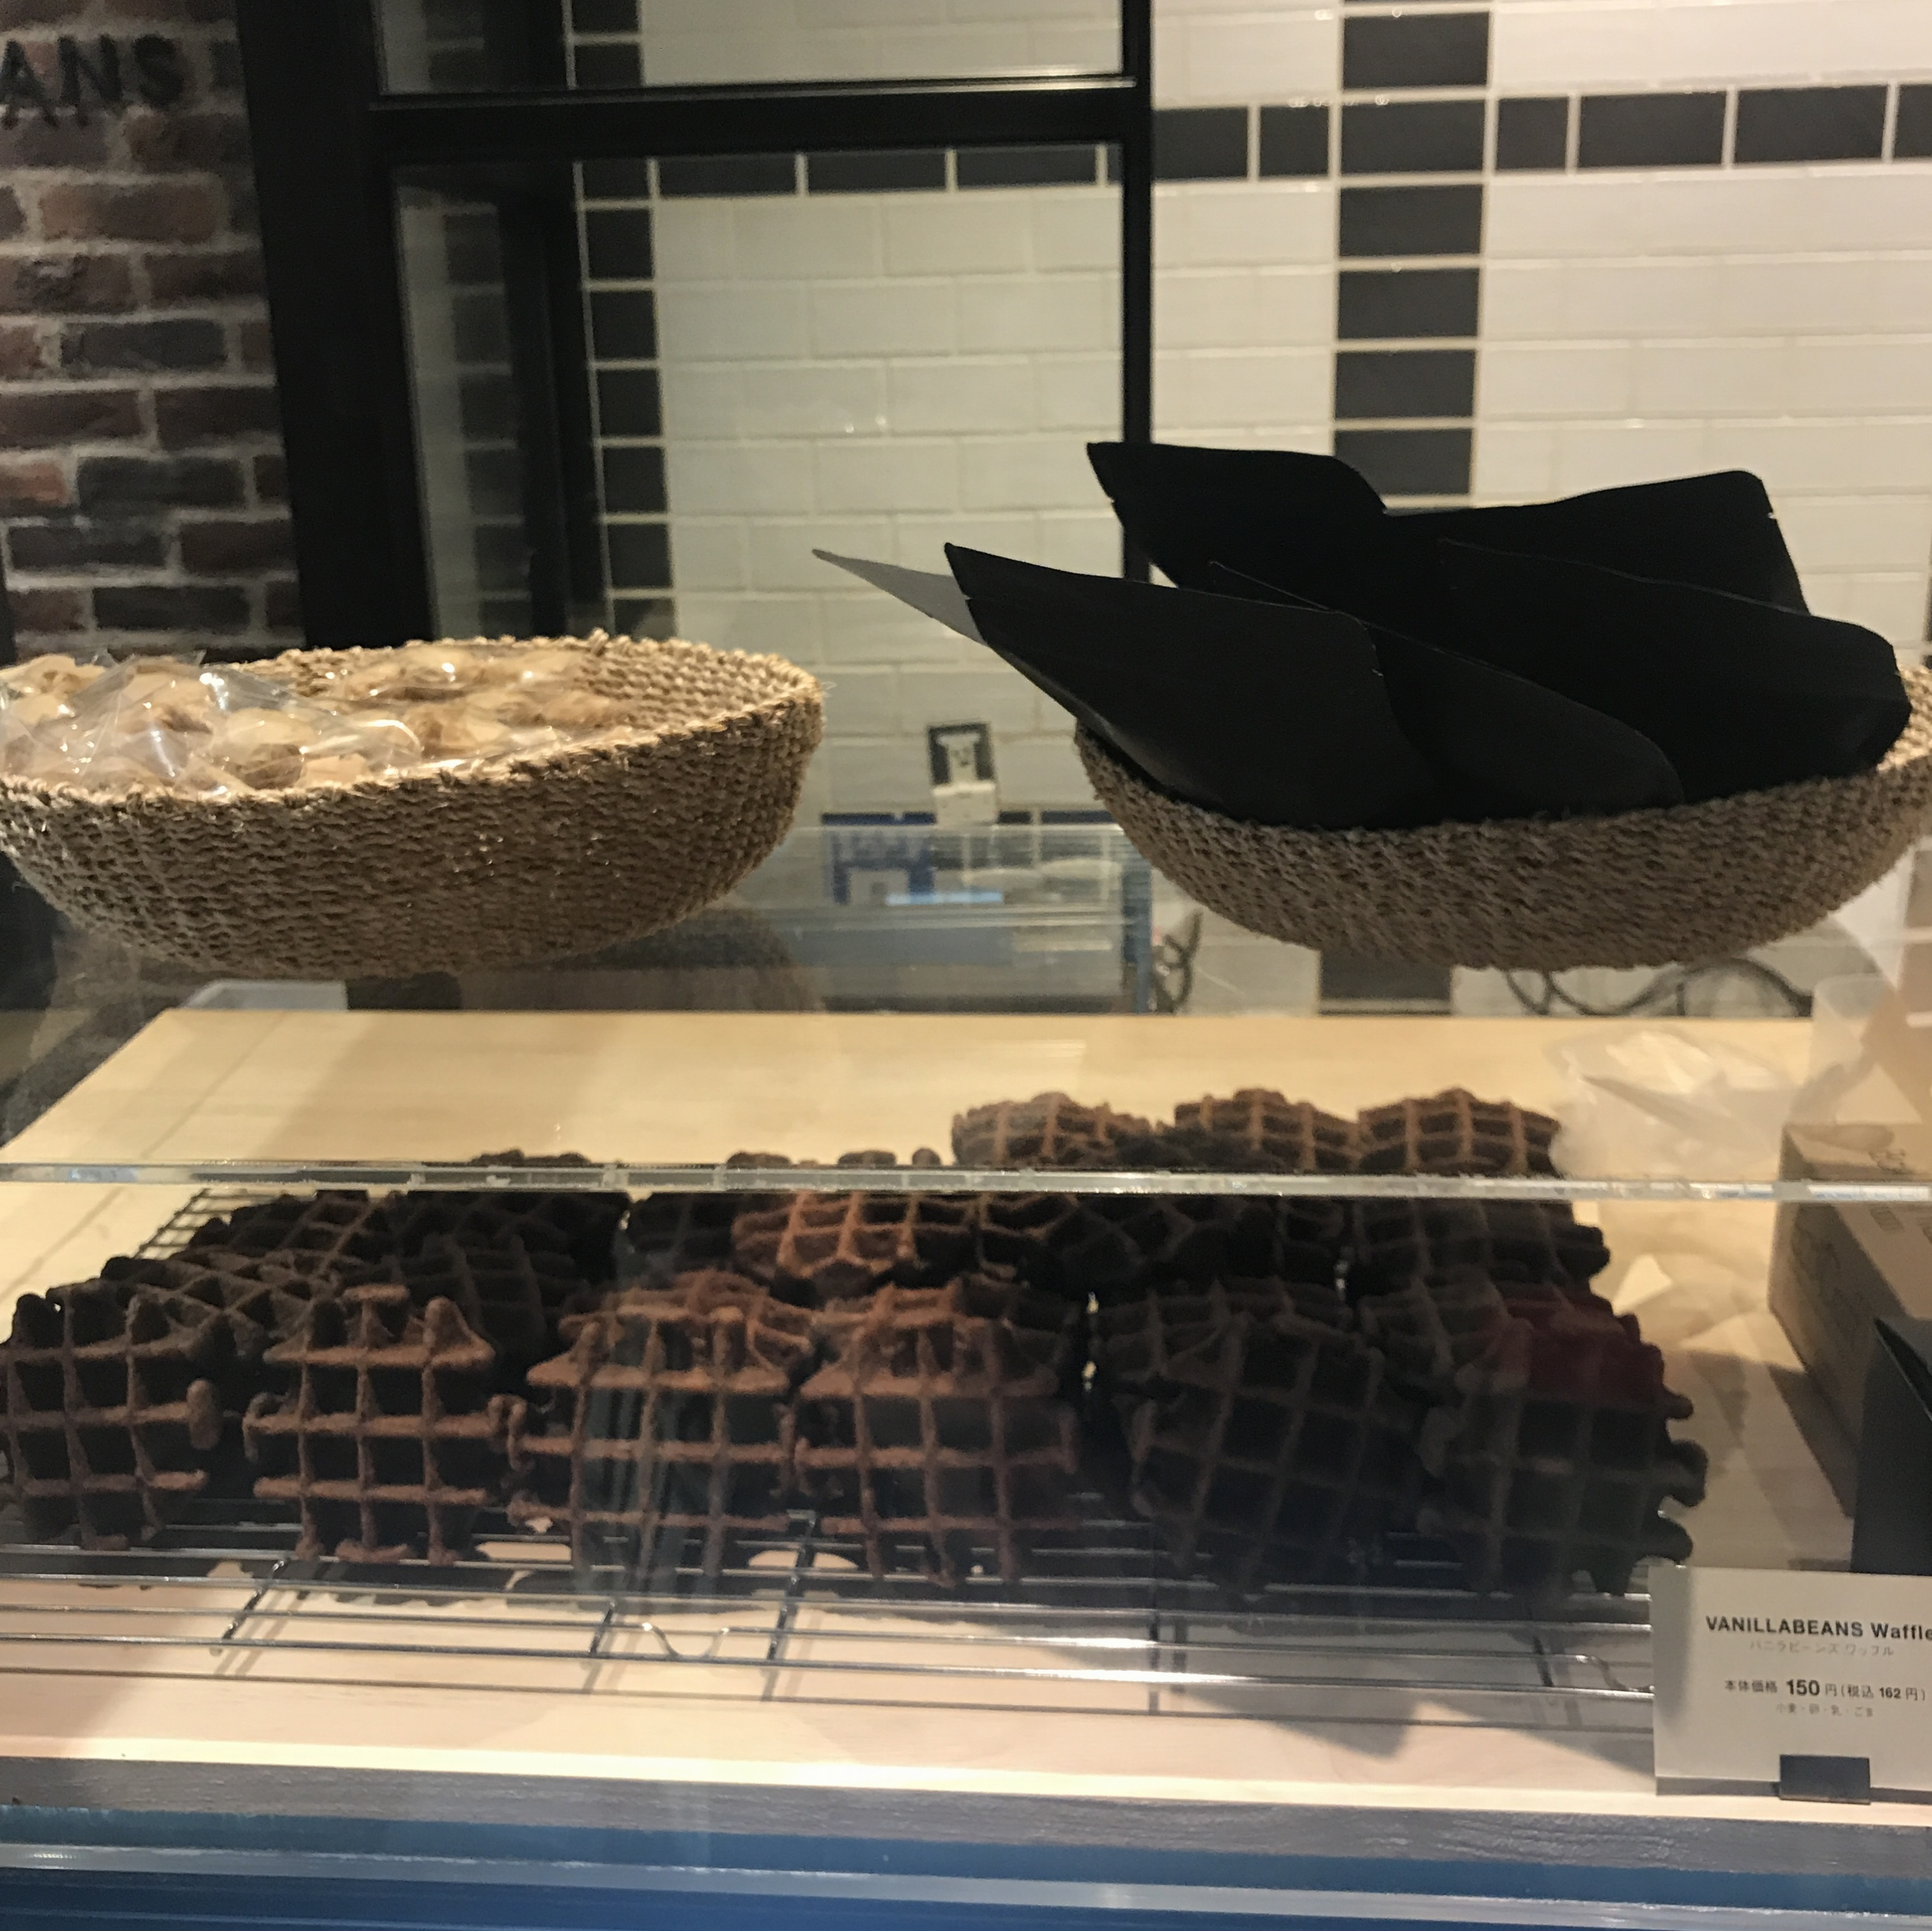 【VANILLA BEANS CAFE】川崎 チョコレートドリンク_2